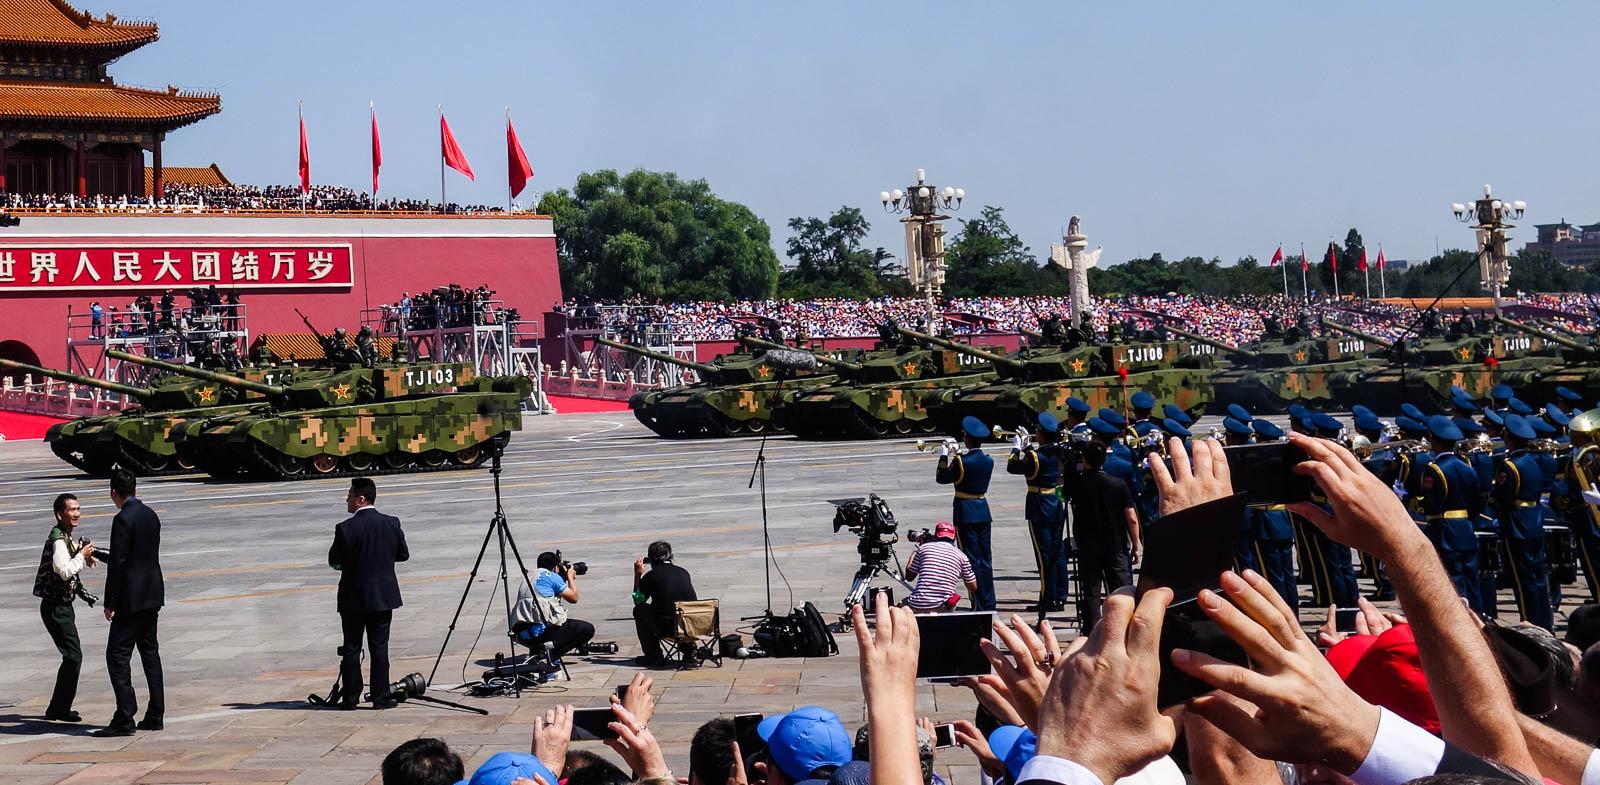 beijing-china-military-parade-2015-28